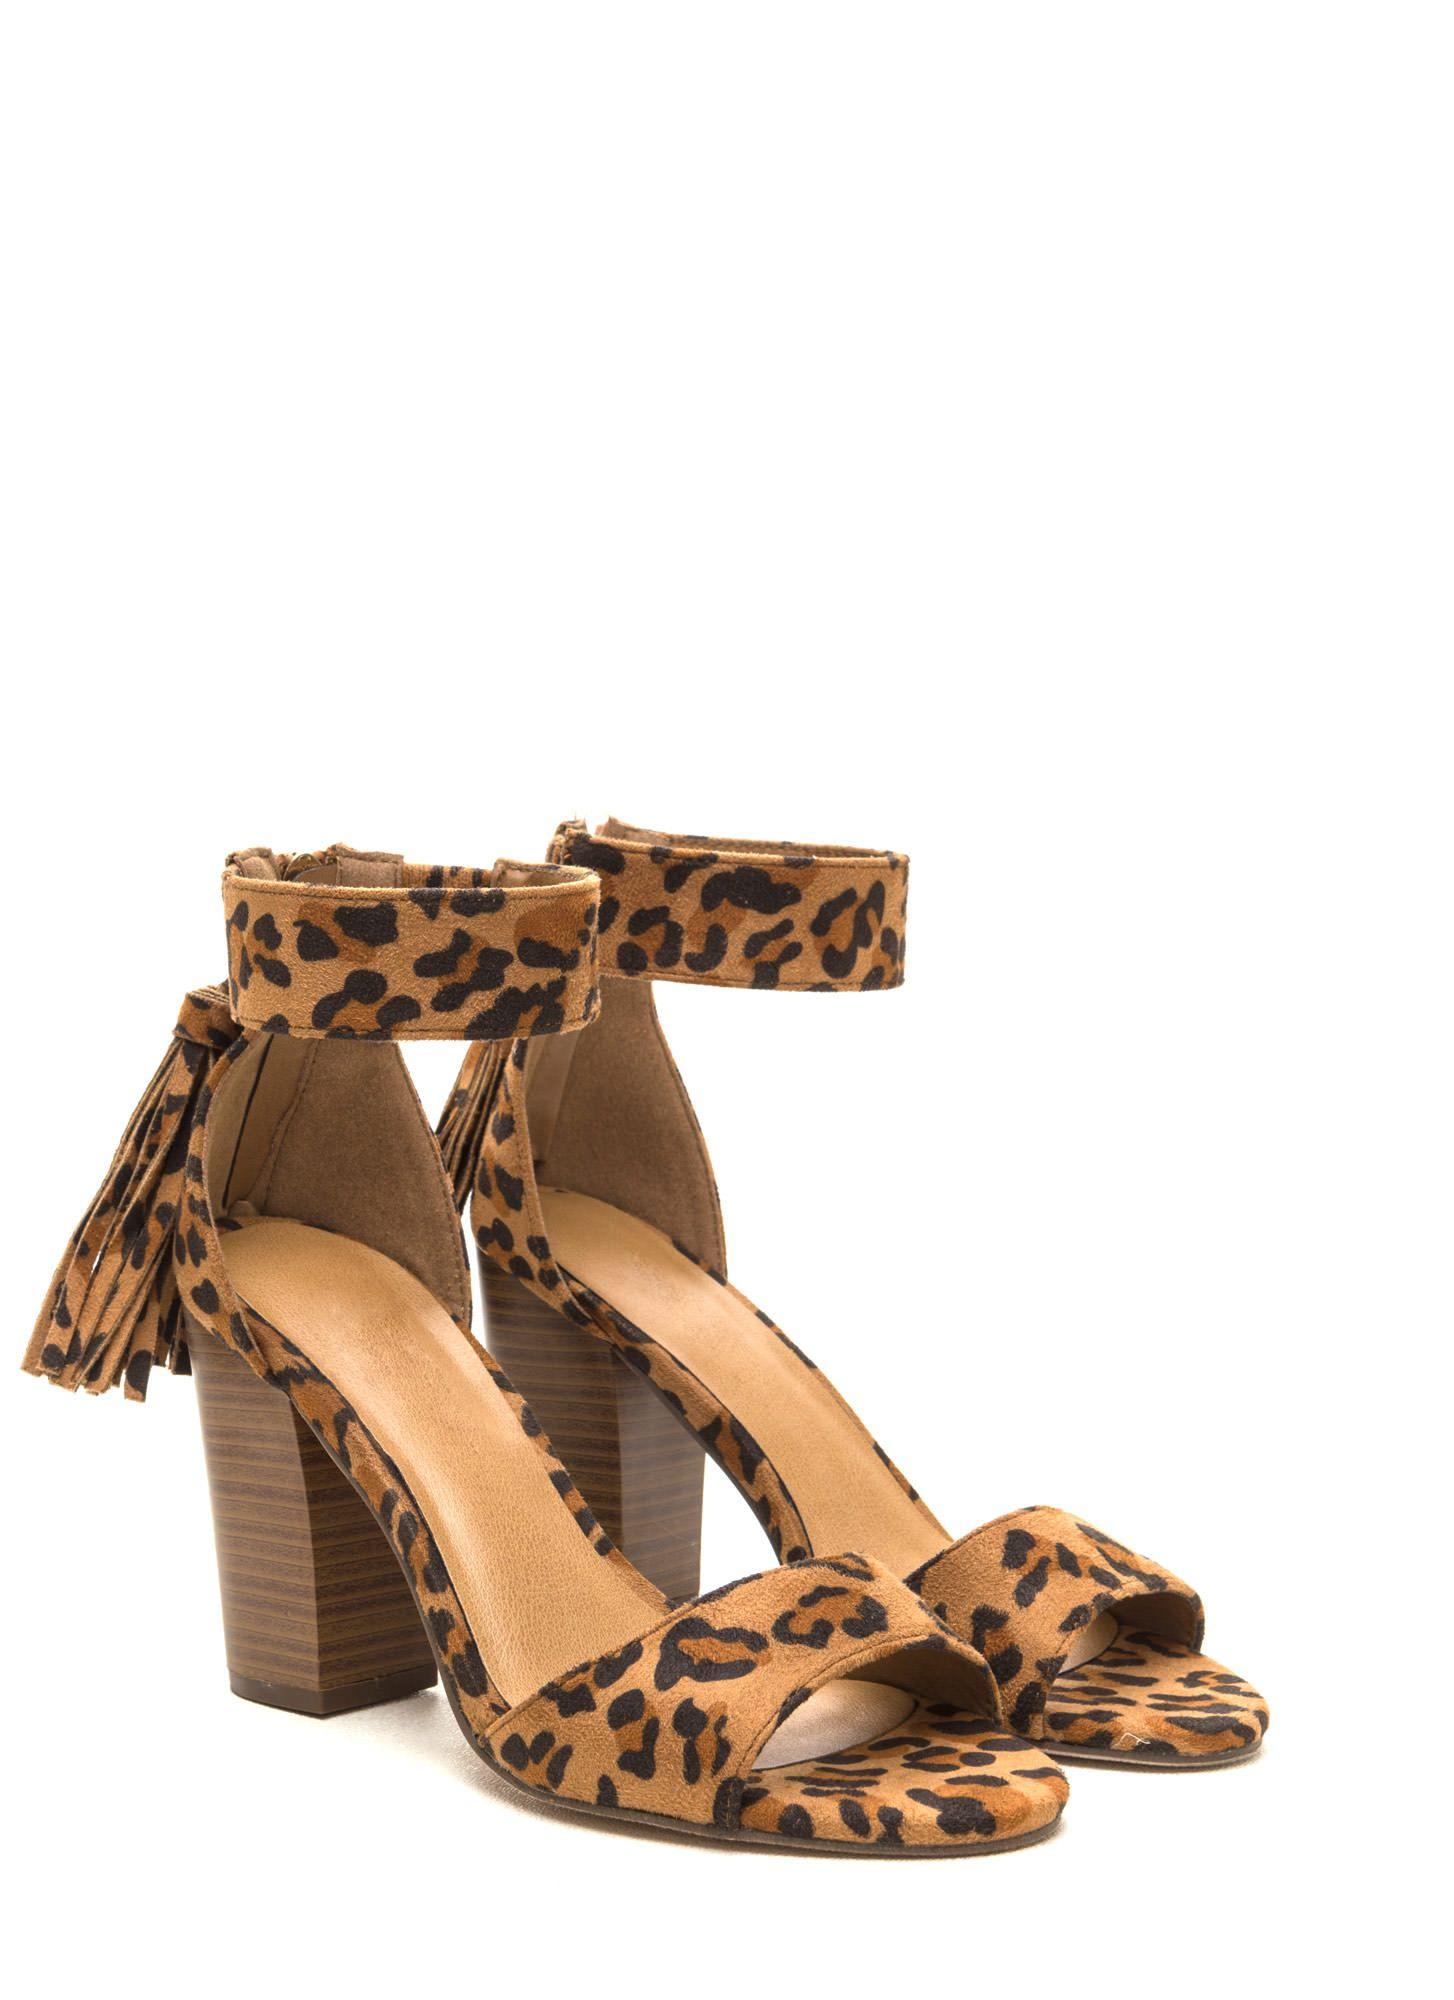 Two To Tassel Leopard Print Heels LEOPARD - GoJane.com   Shoes ...